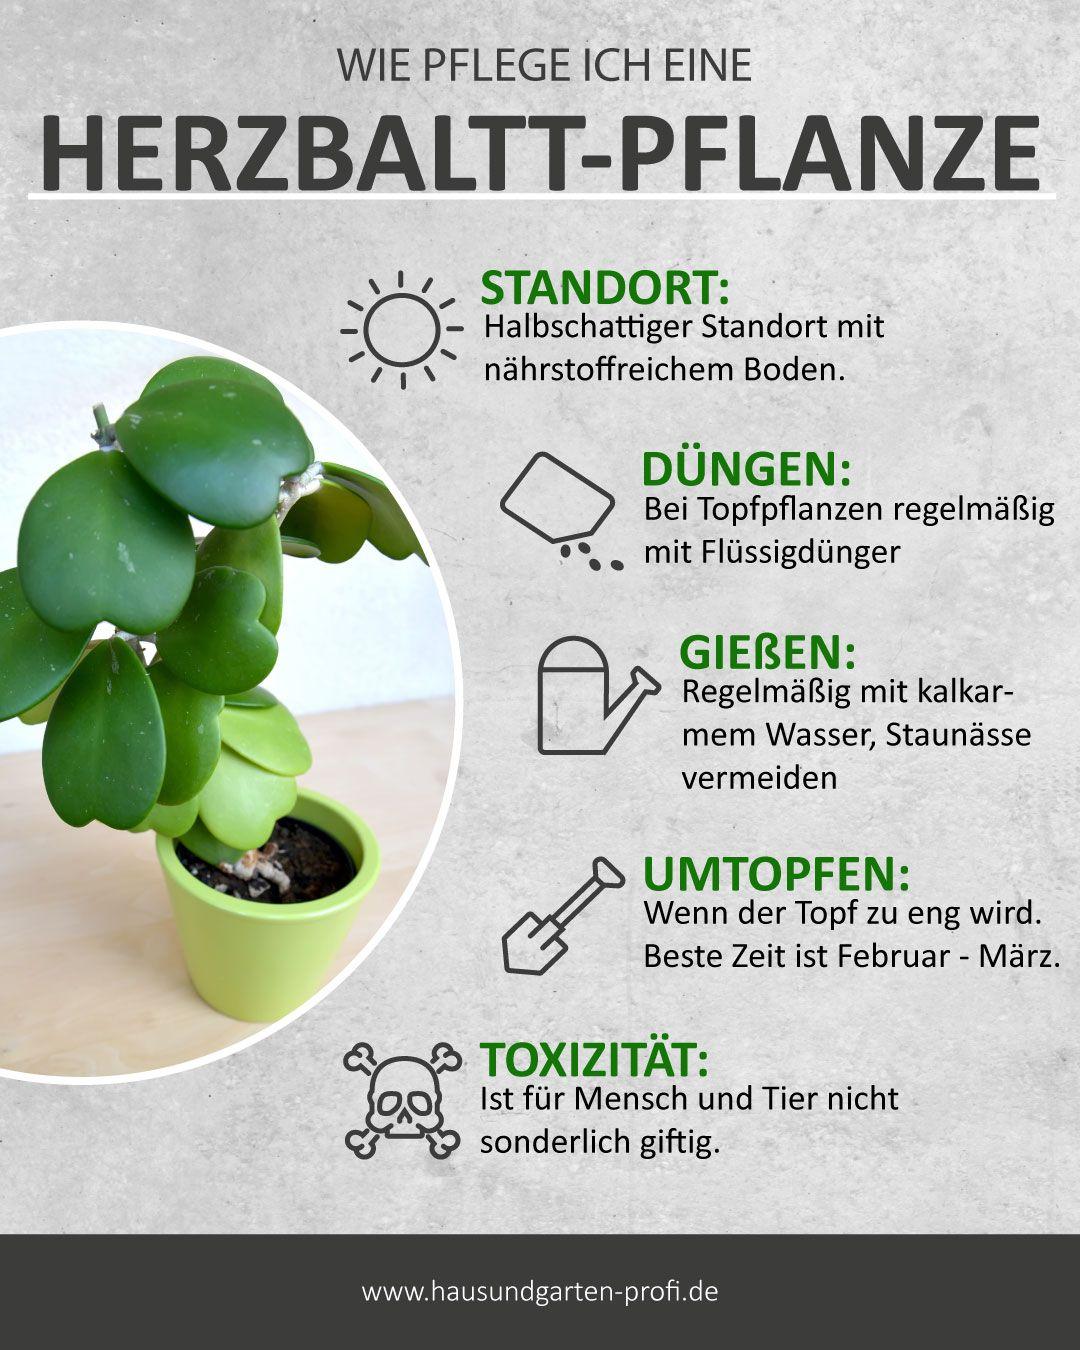 Herzblatt-Pflanze: Pflege, Standort, Gießen, Düngen – So geht's